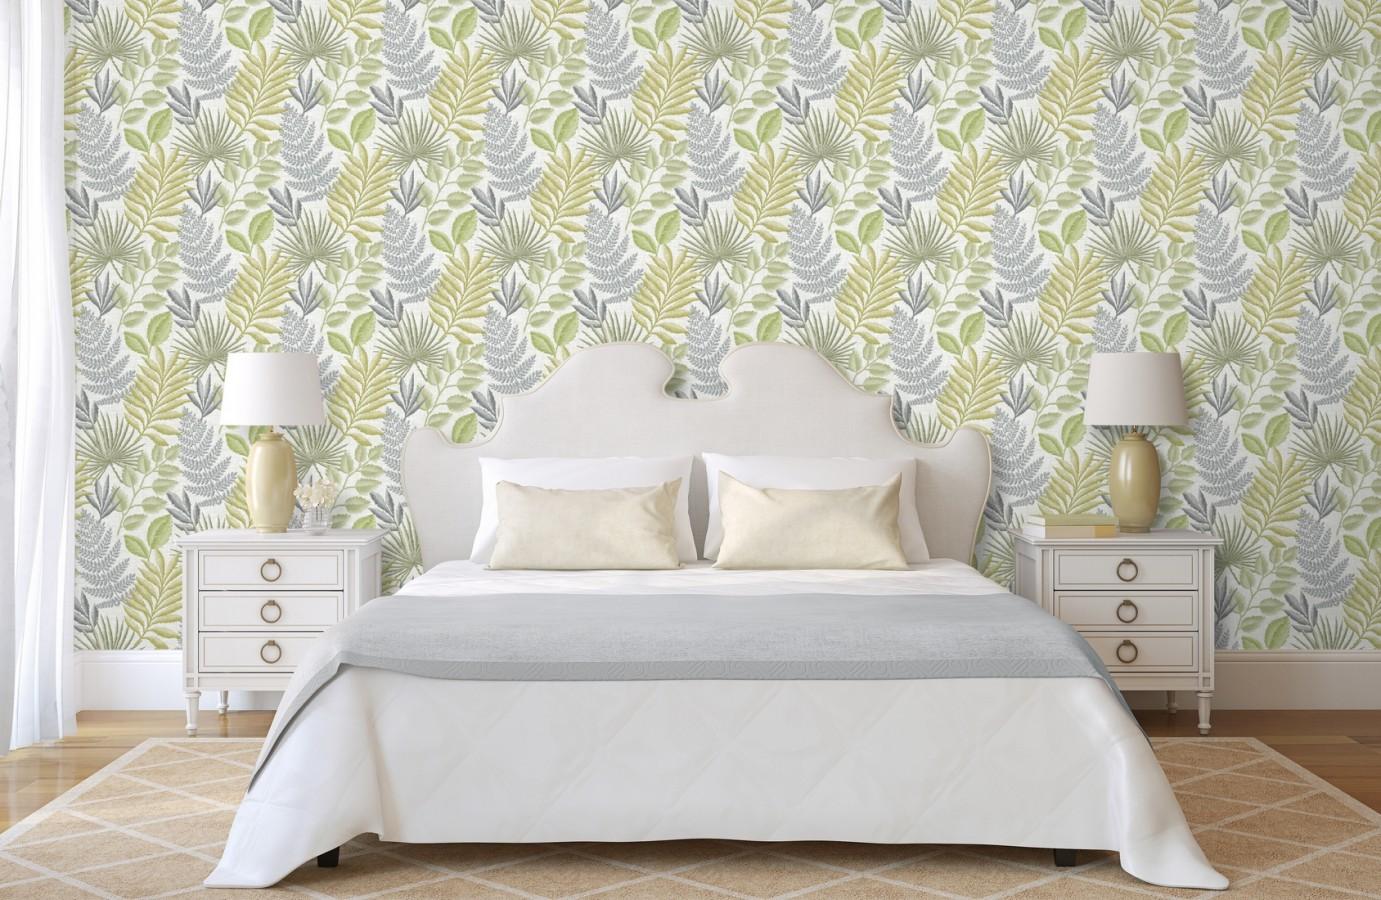 Papel pintado hojas silvestres estilo tropical Acapulco 679568